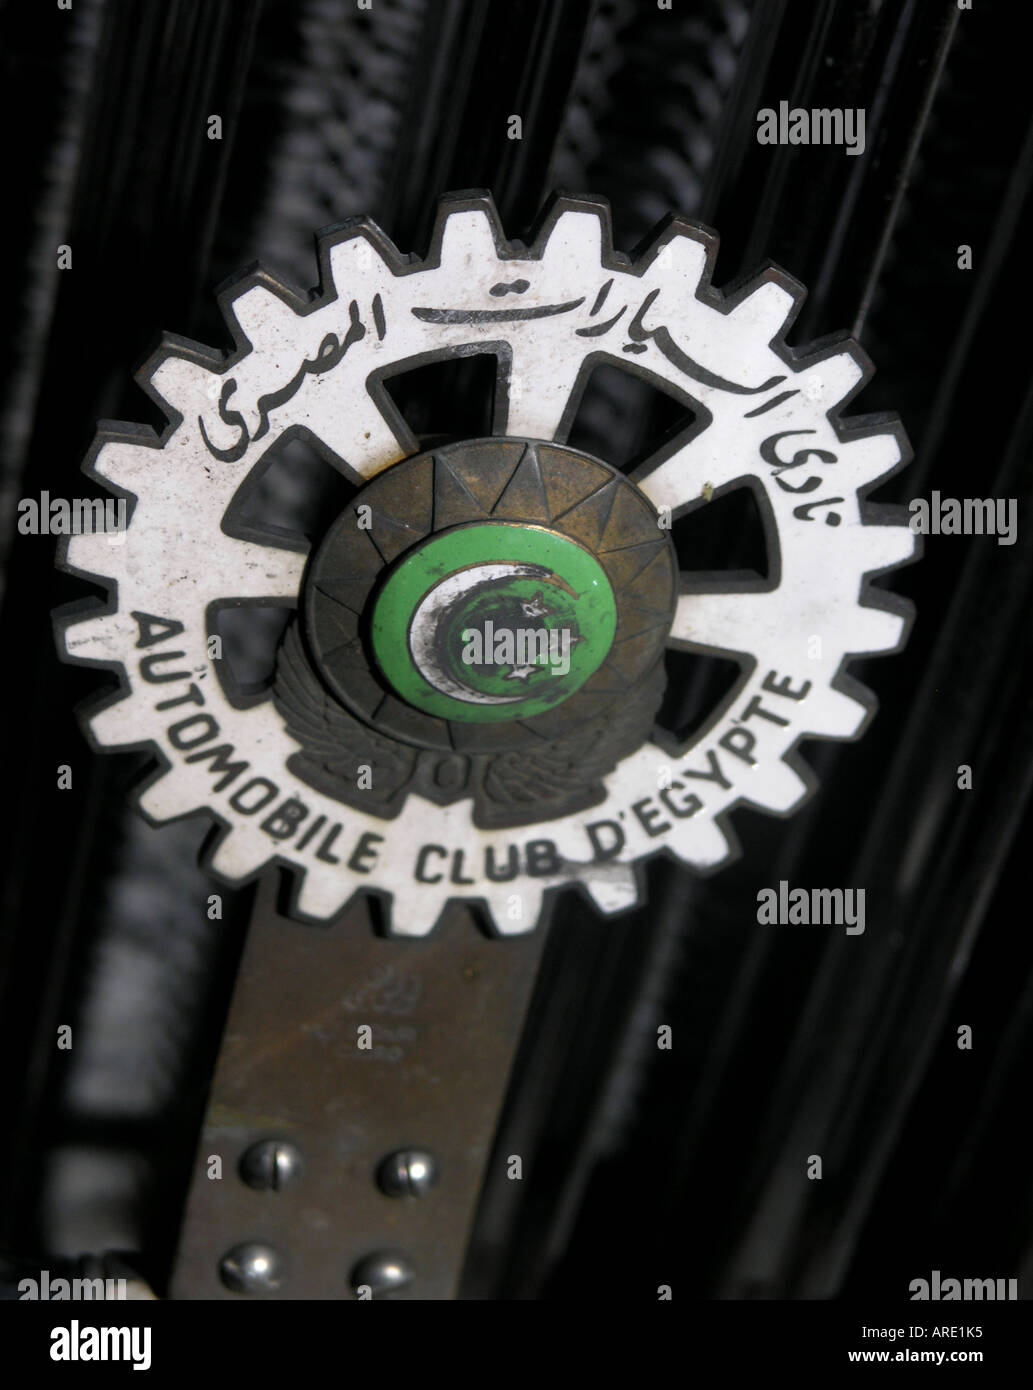 Automobile Club D'Egypte badge - Stock Image